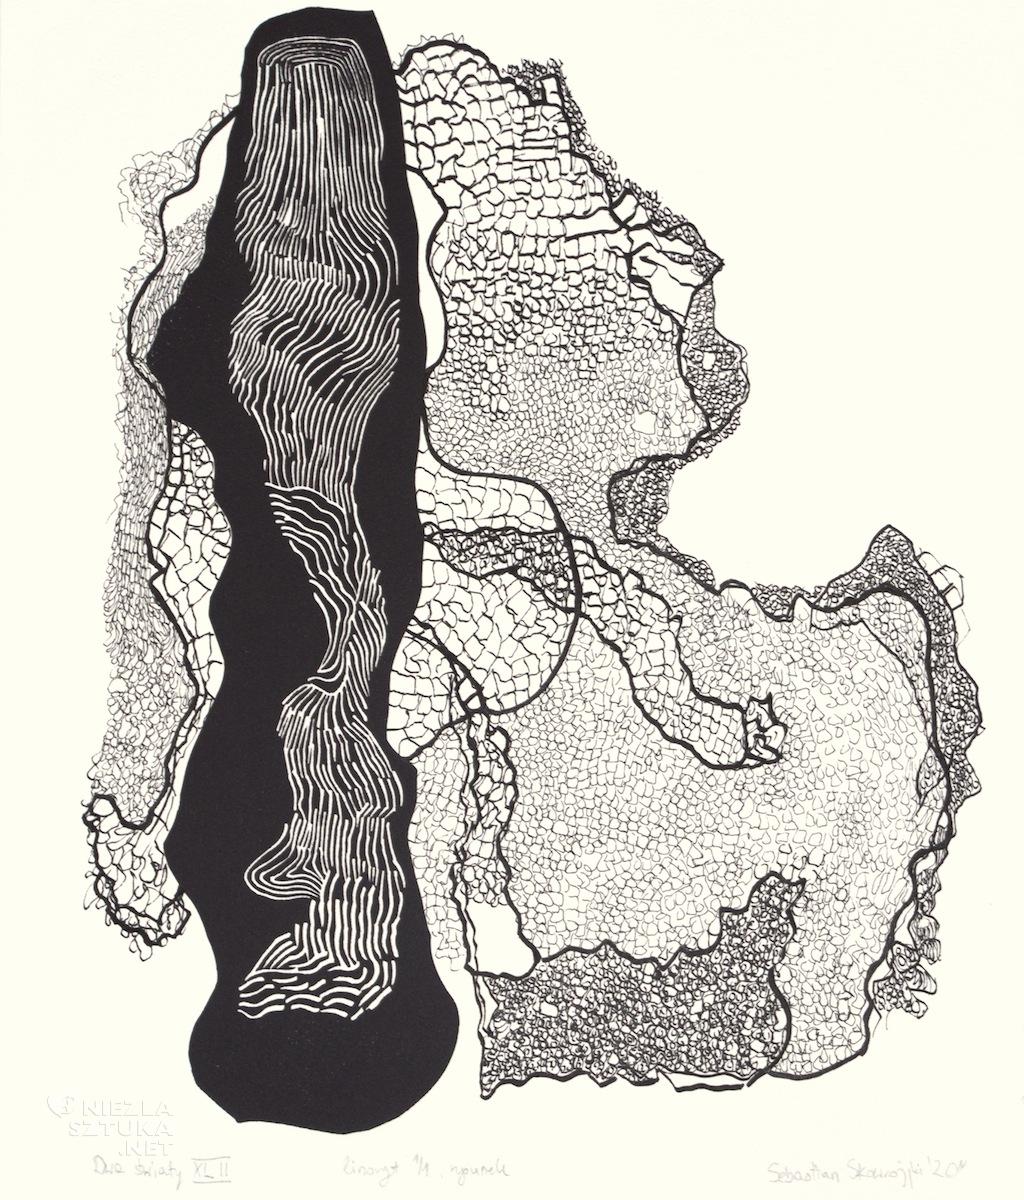 Sebastian Skowroński grafika